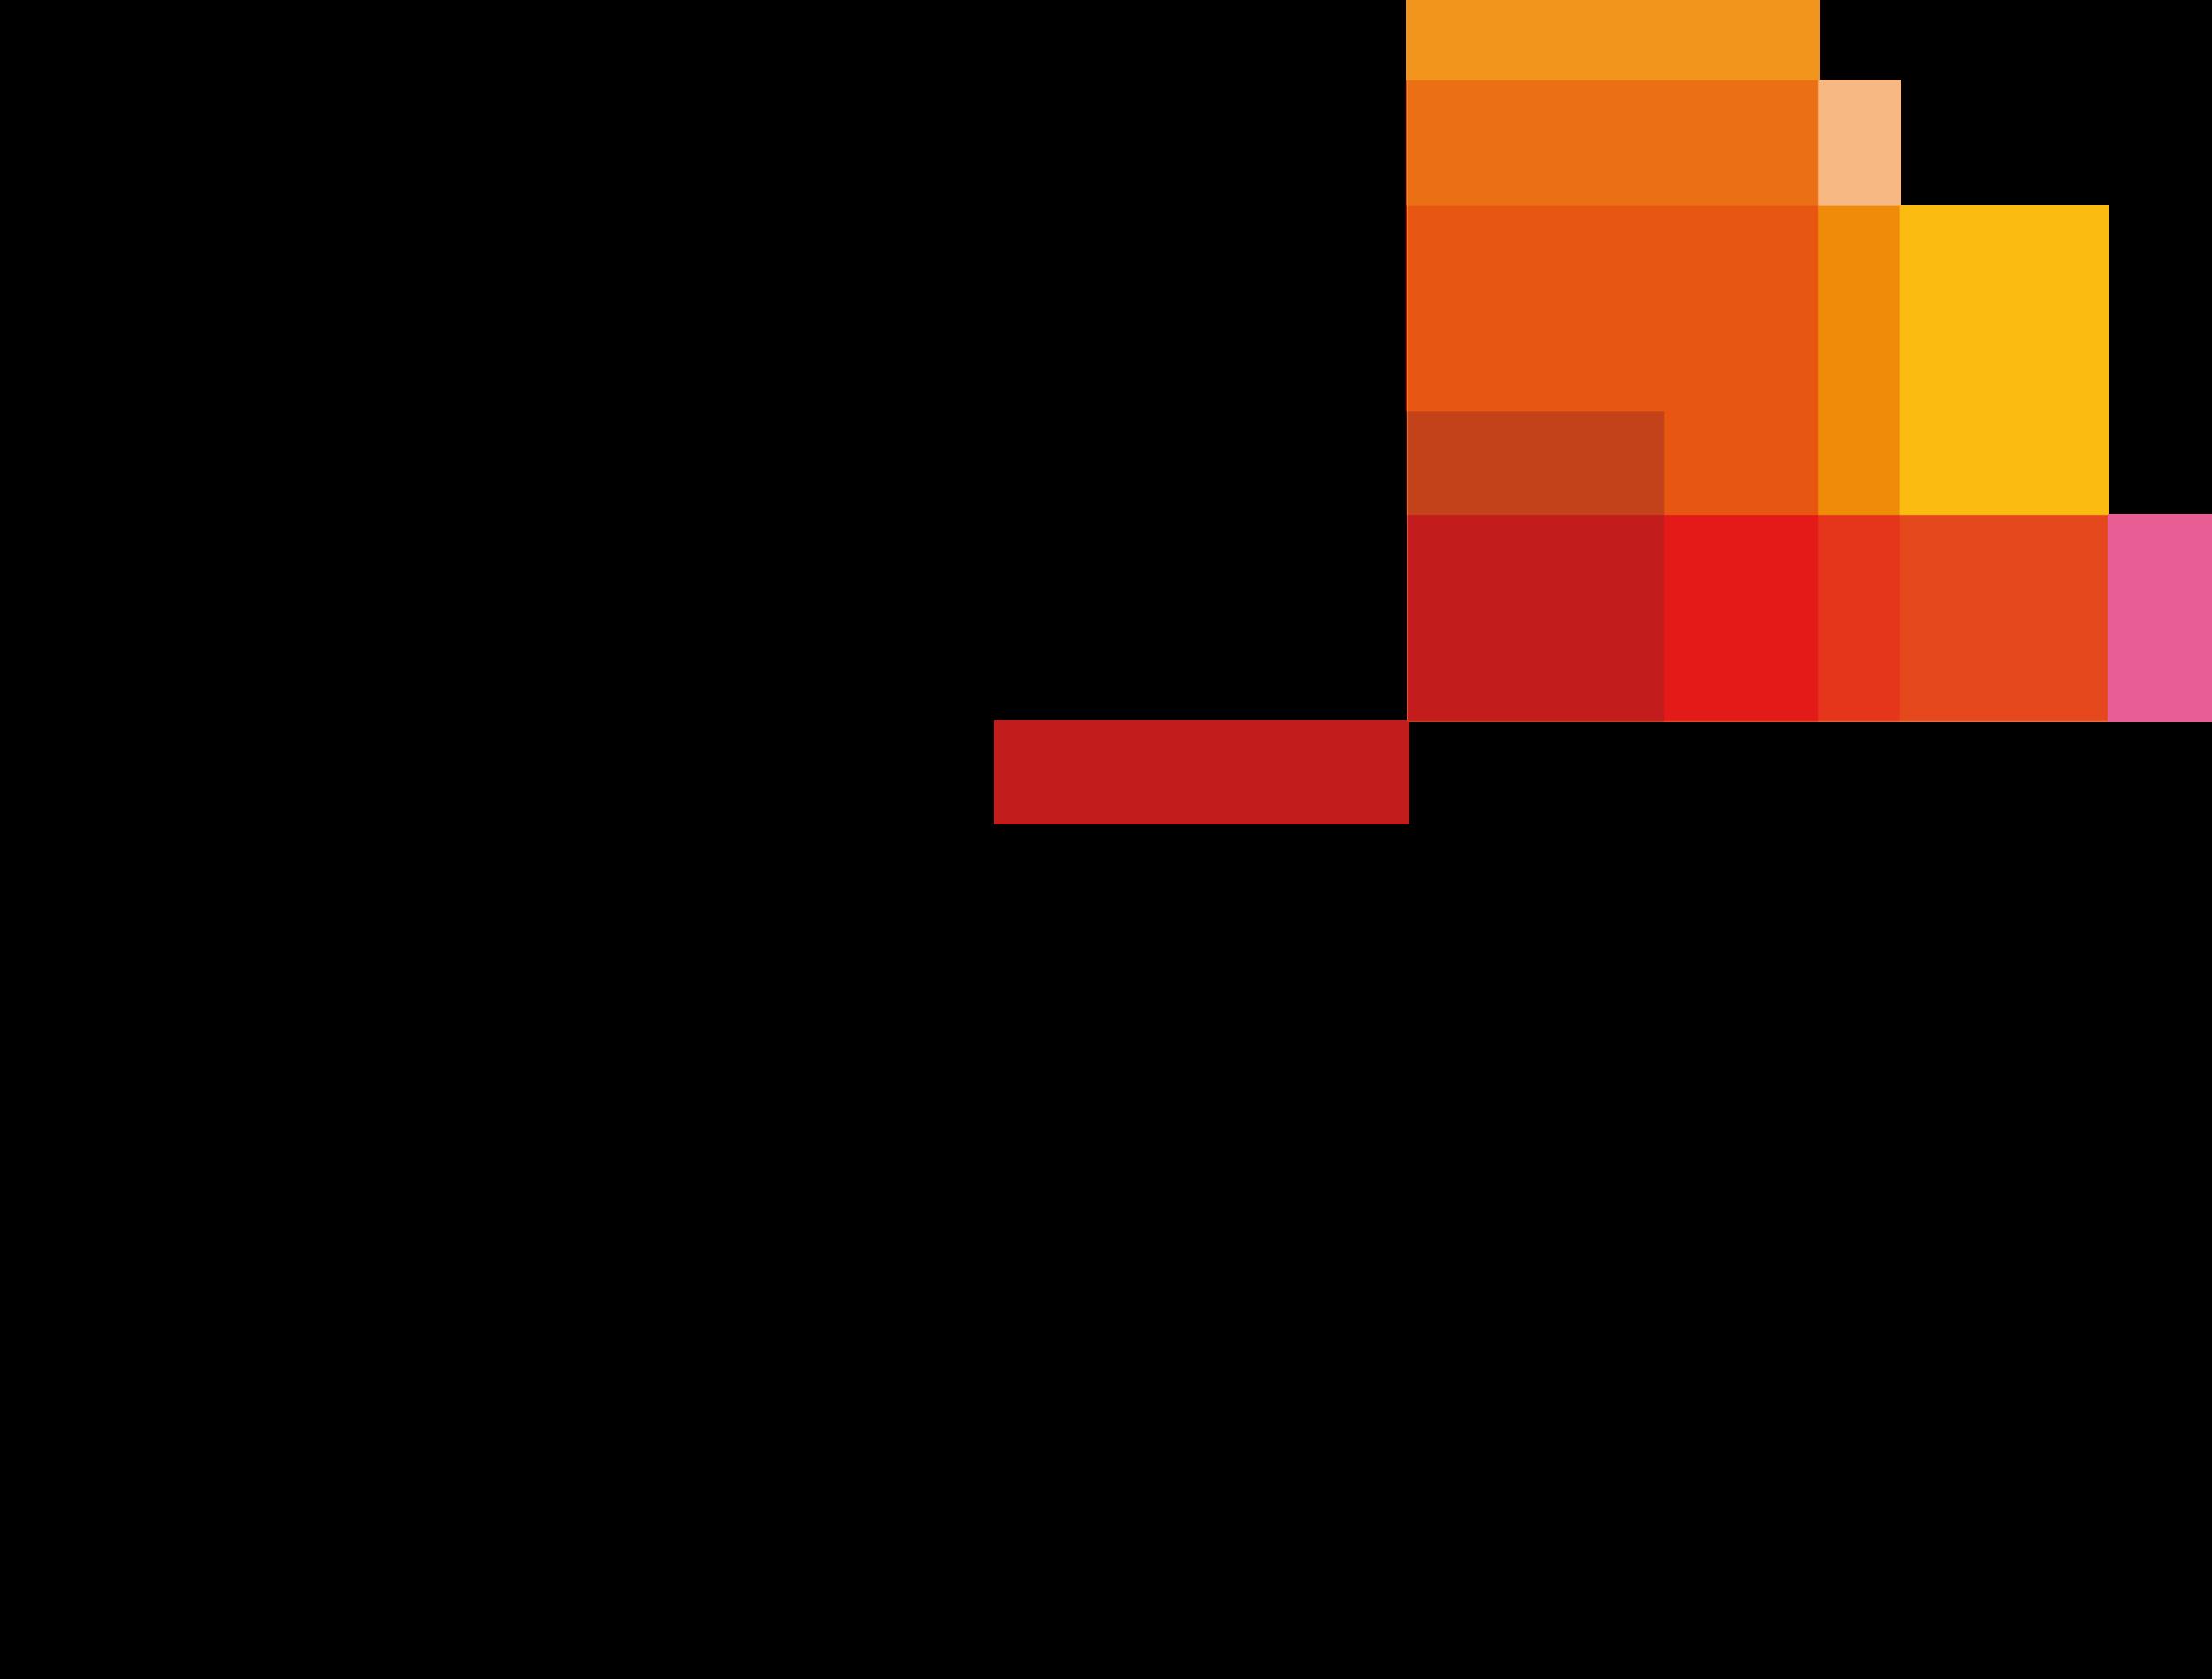 PwC_logo_HD.png